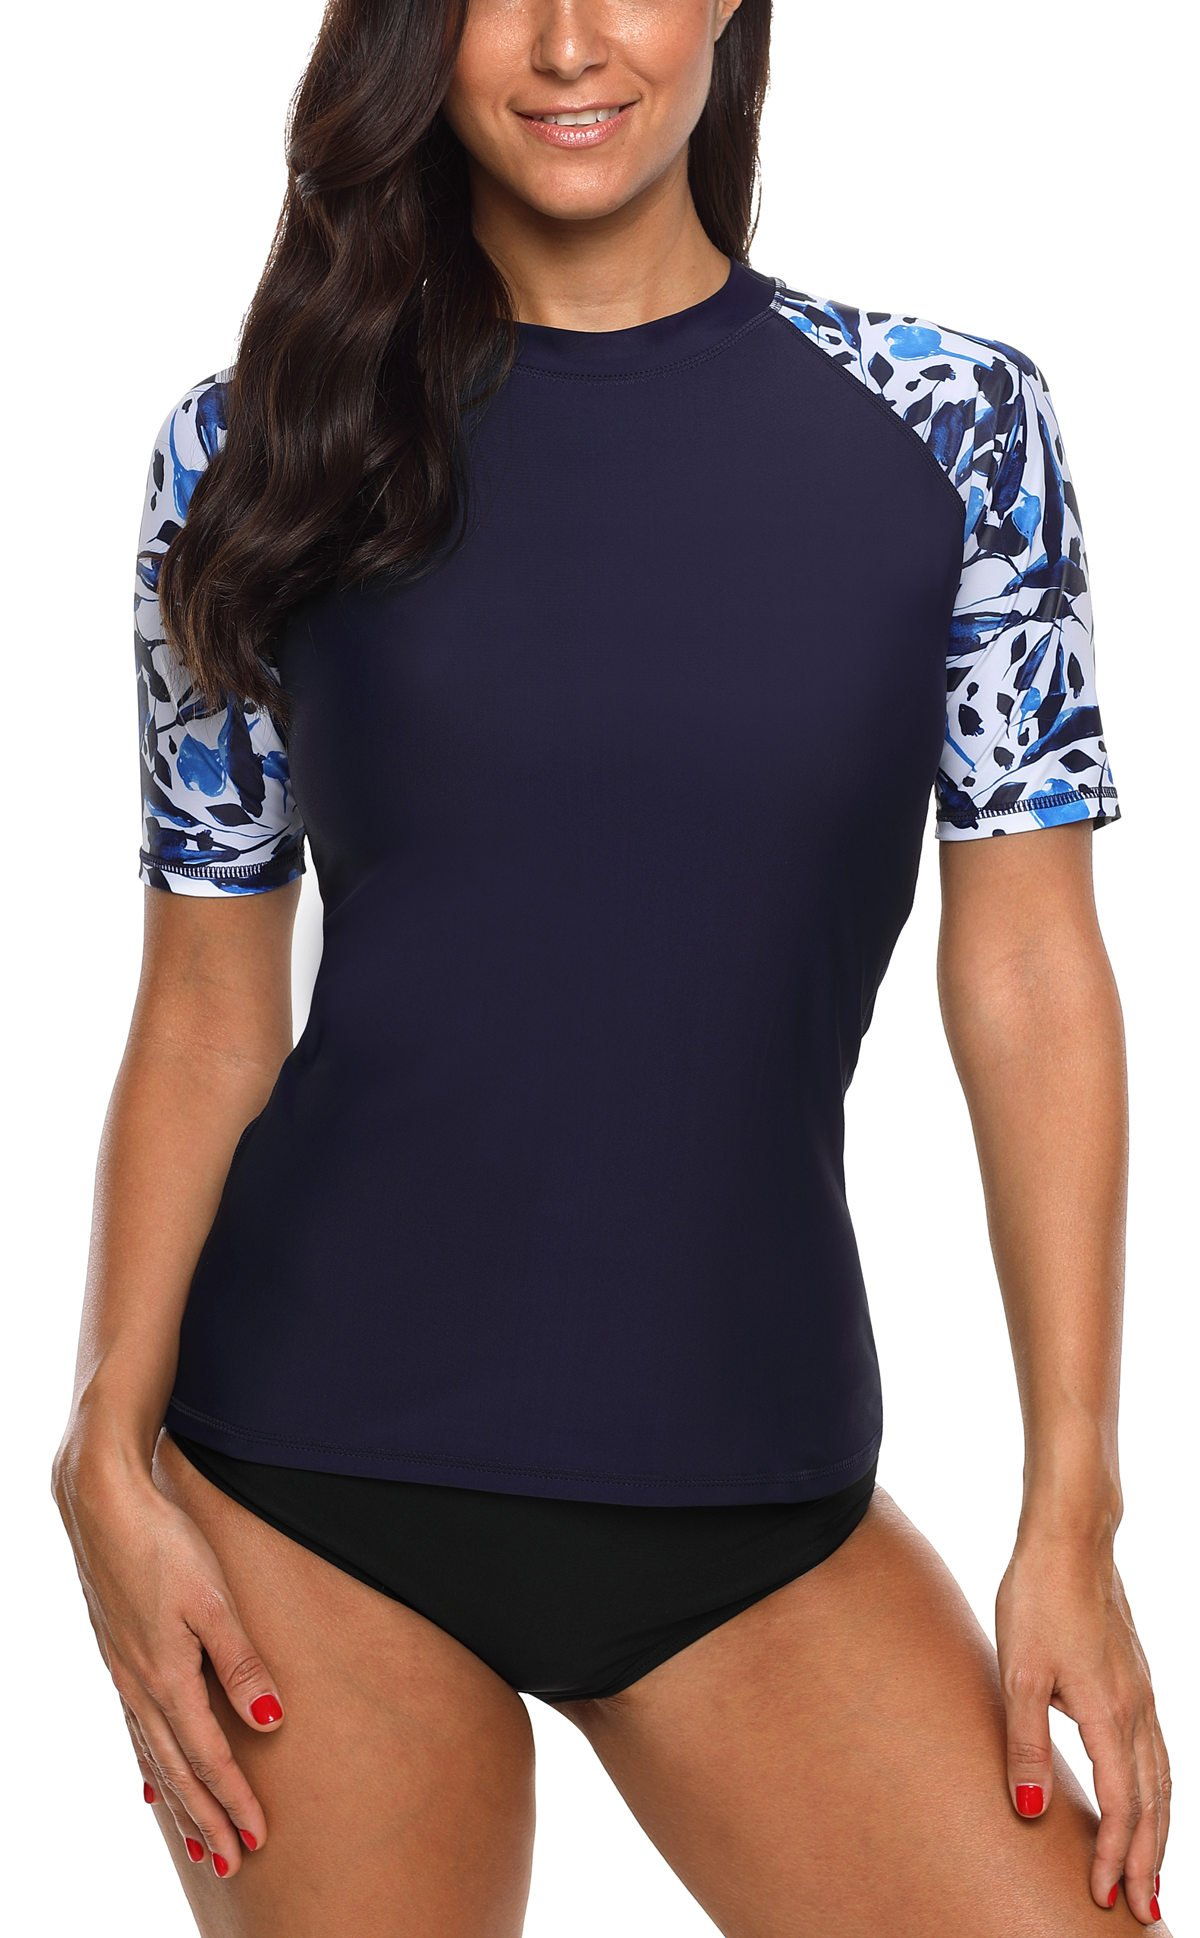 beautyin Short Sleeve Rashguard Swimsuit for Womens Sun Protection Rash Guard XL by beautyin